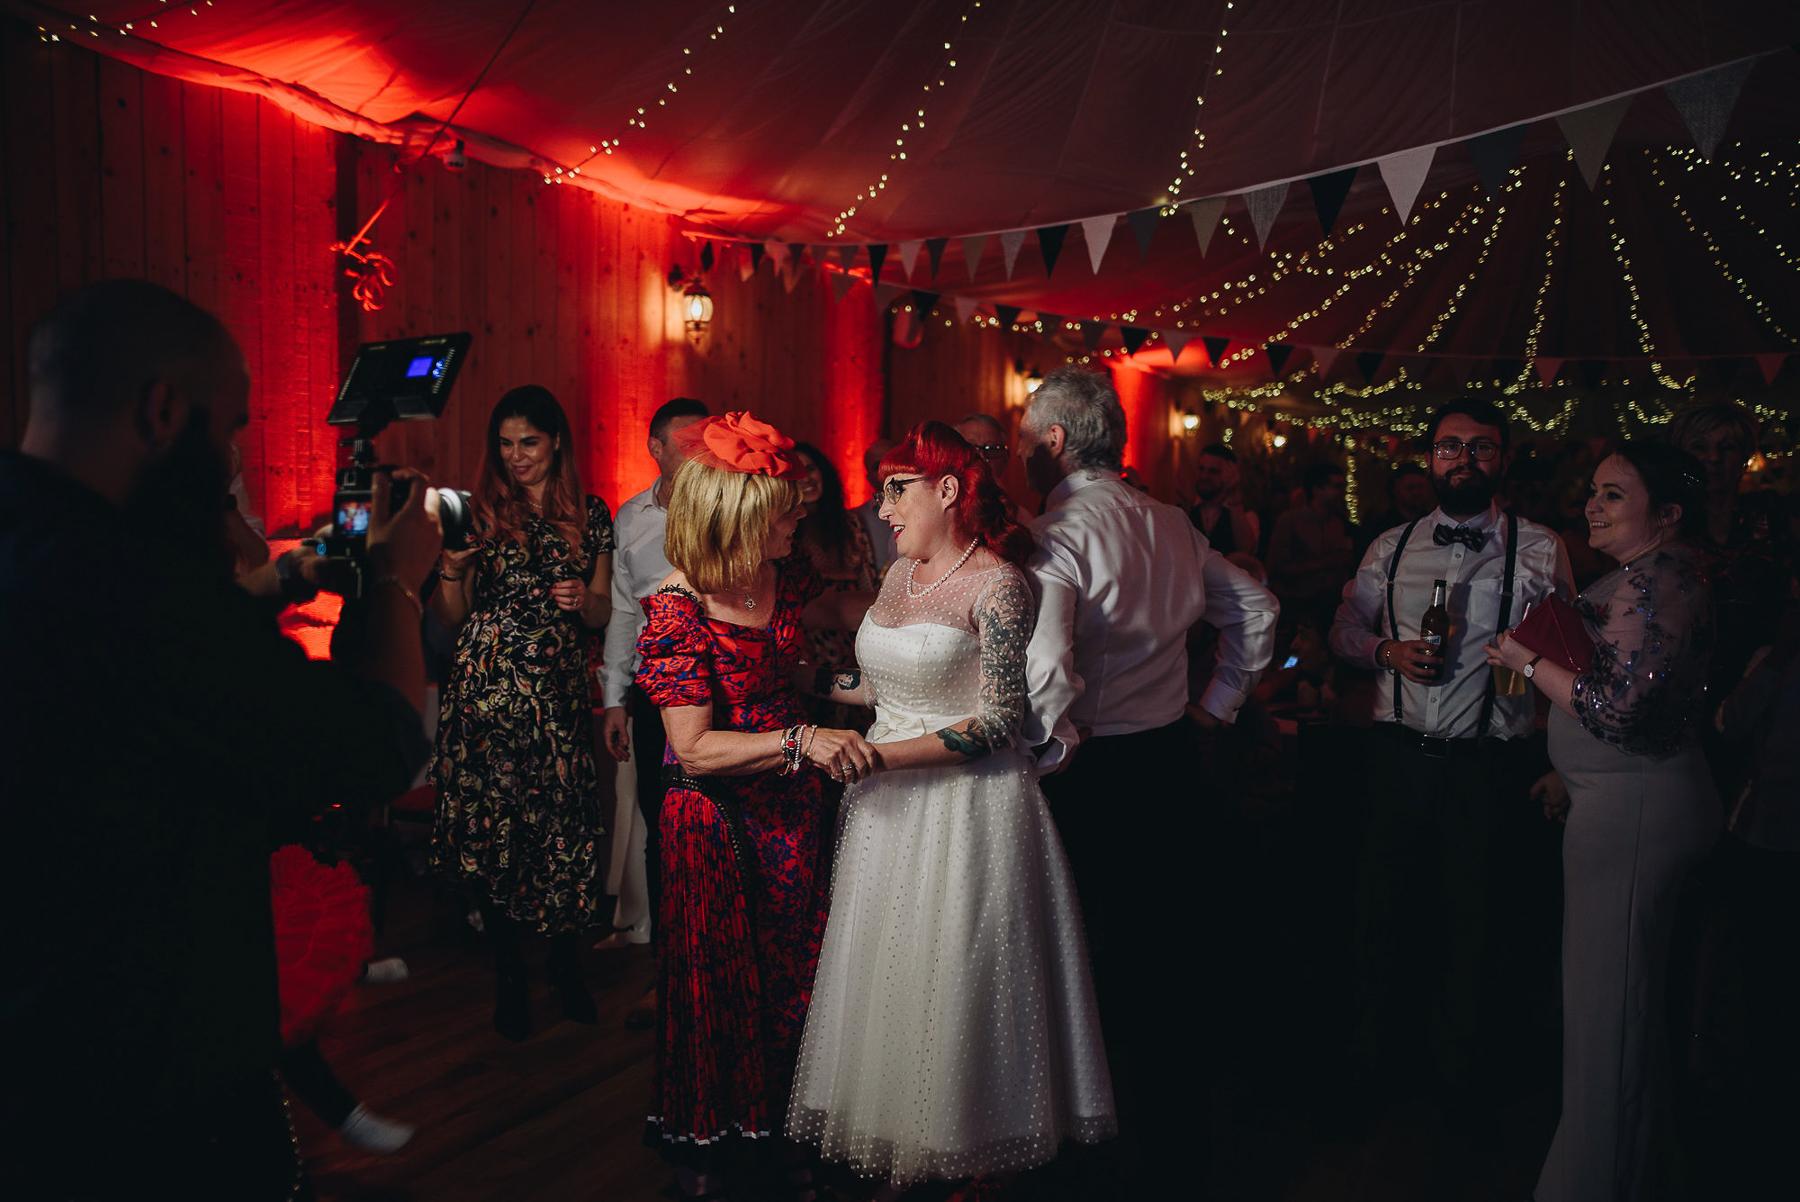 Wellbeing_Farm_Wedding_Photography_The_Pin-Up_Bride_Lara_Shaun-152.jpg